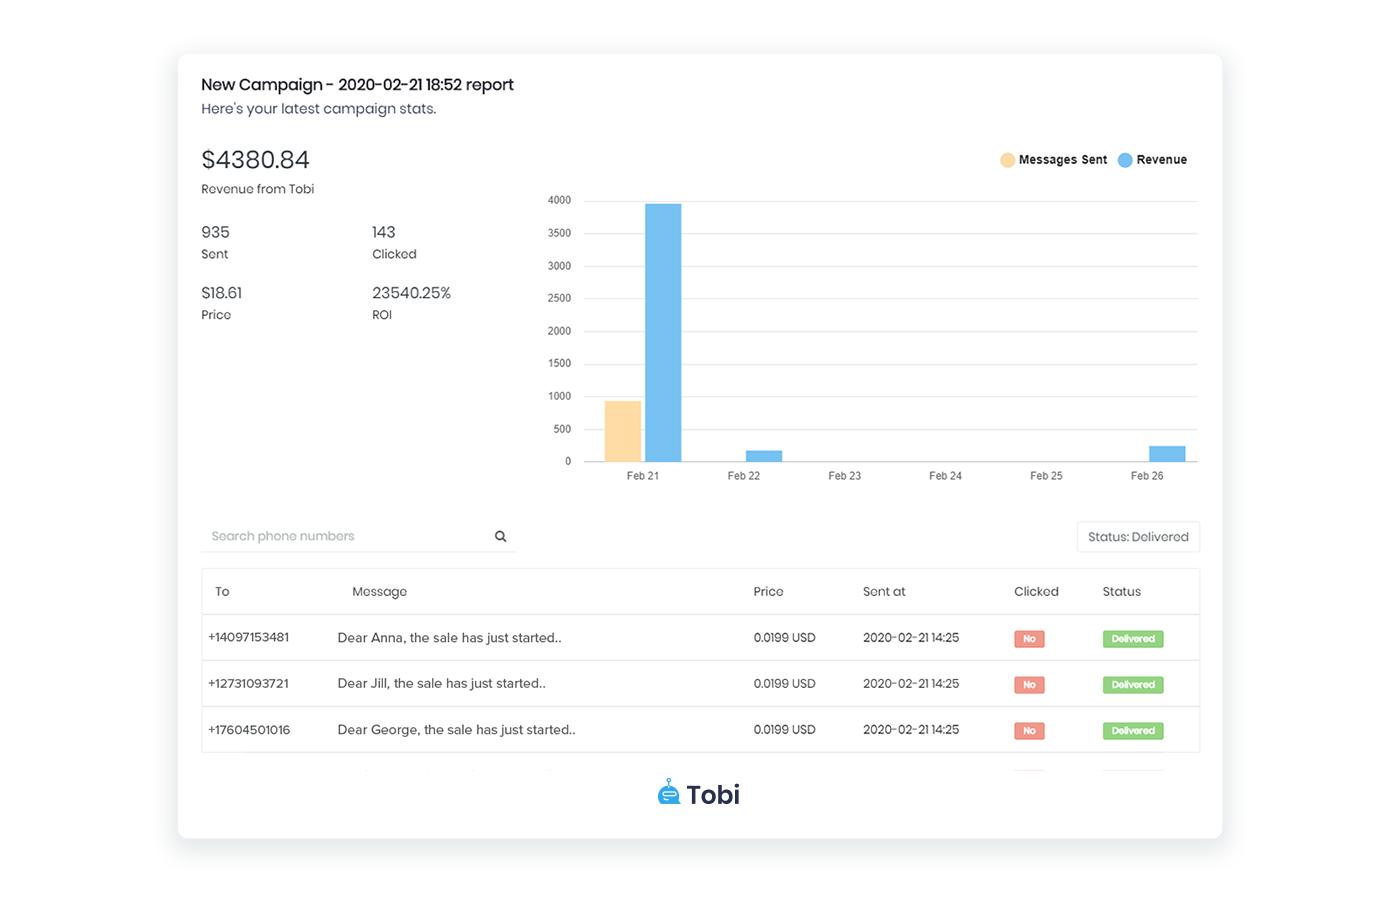 Tobi SMS promotional campaign statistics